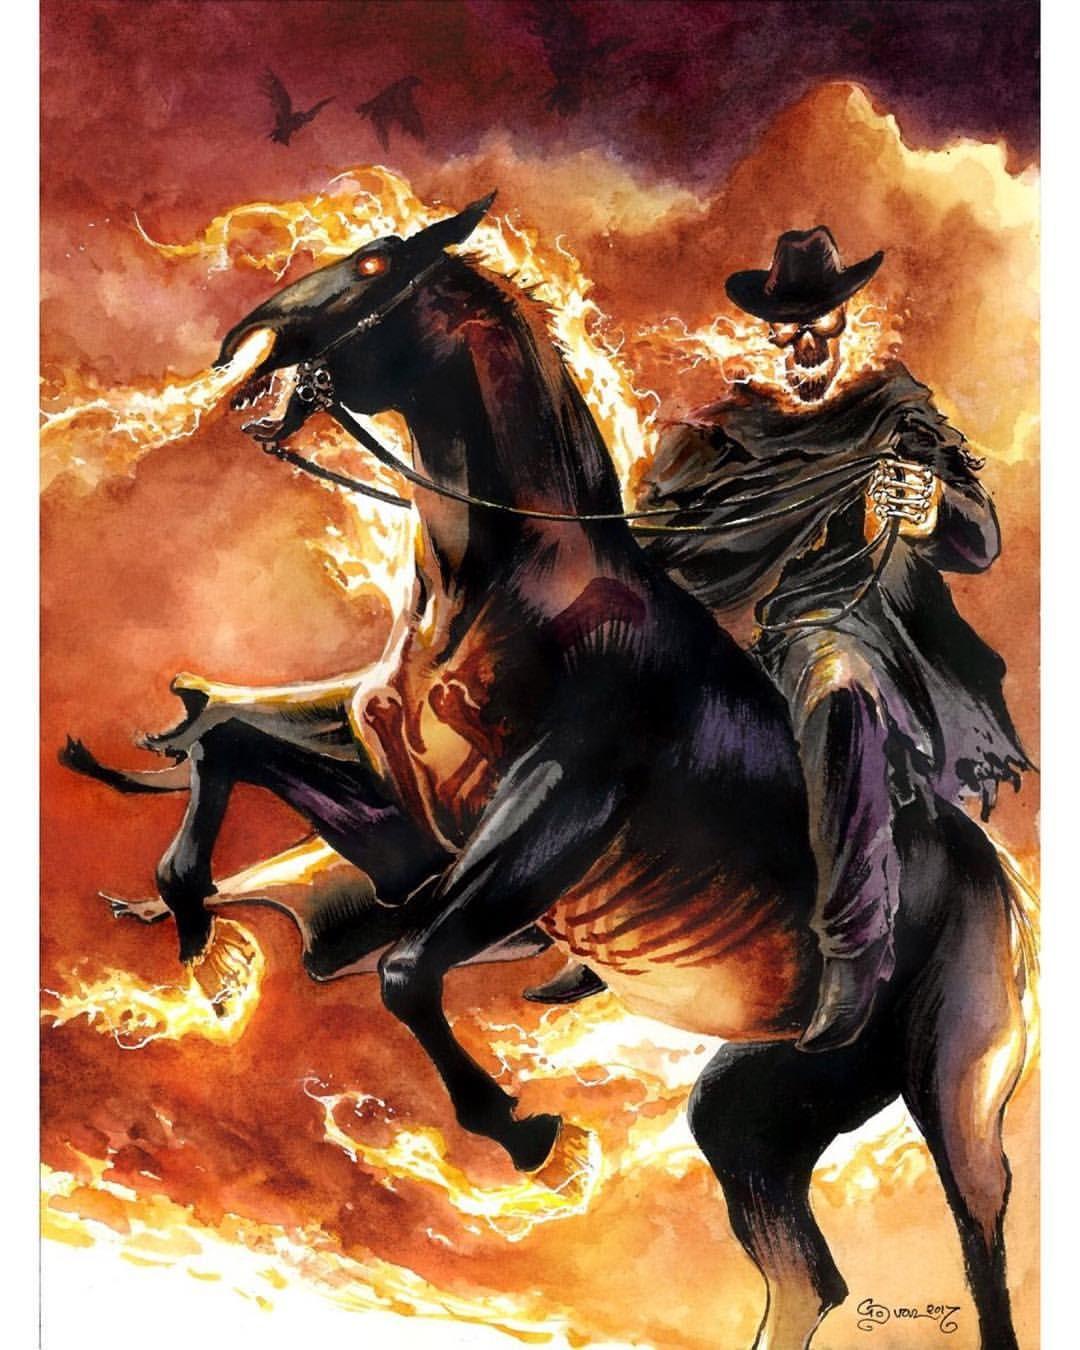 1961 Perry Rhodan: Ghost Rider By Daniel Govar #watercolor #ink